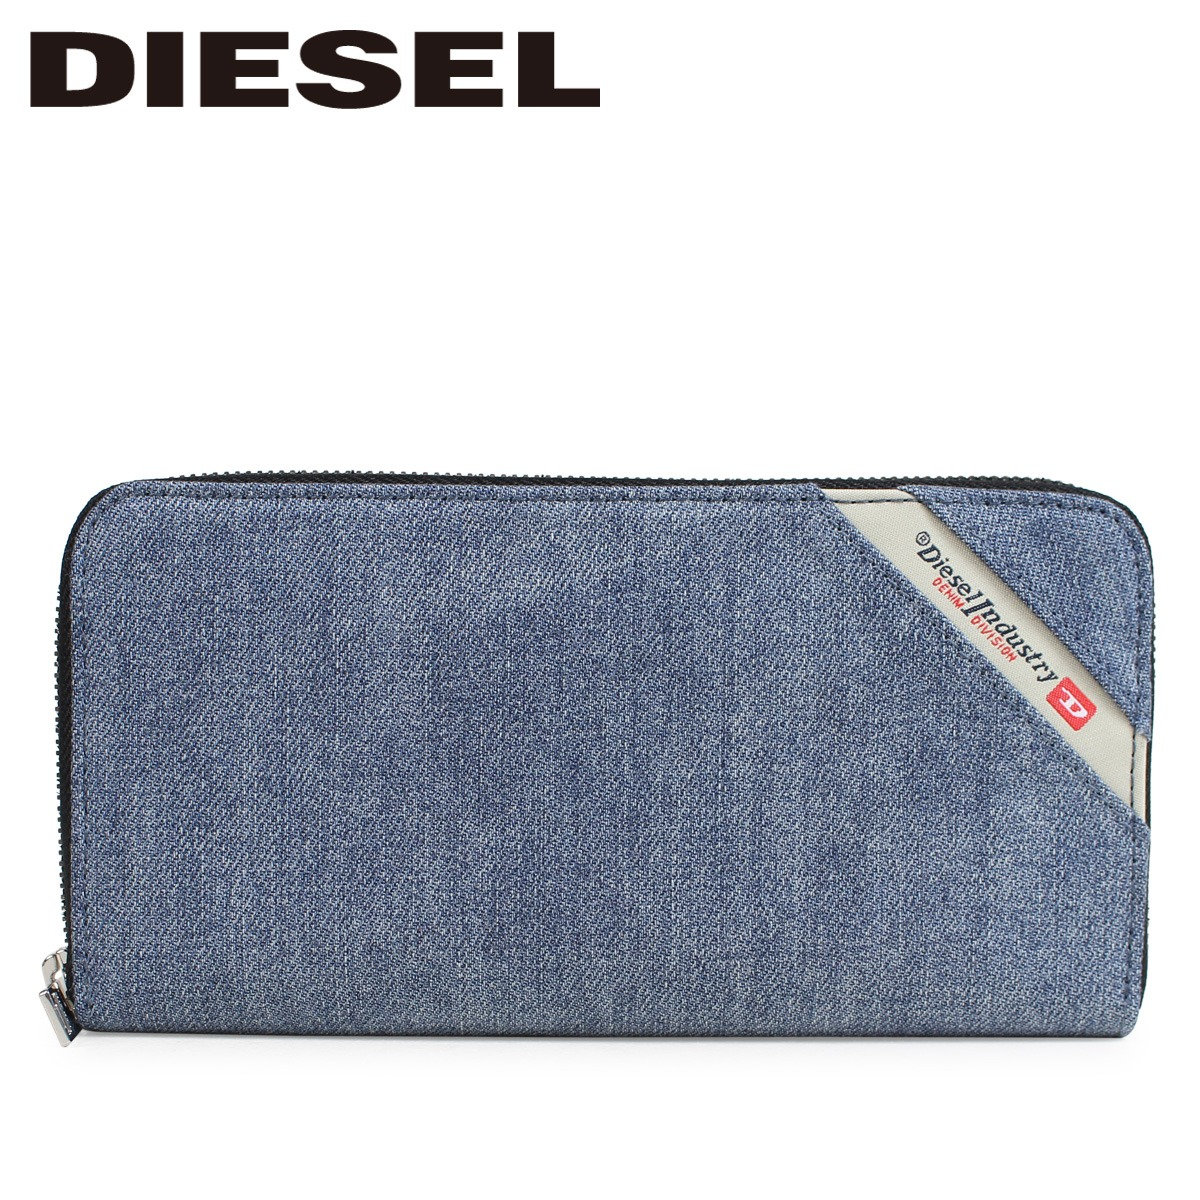 DIESEL DENIMLINE 24 ZIP ディーゼル 財布 メンズ 長財布 ラウンドファスナー ブルー X05271 PS778